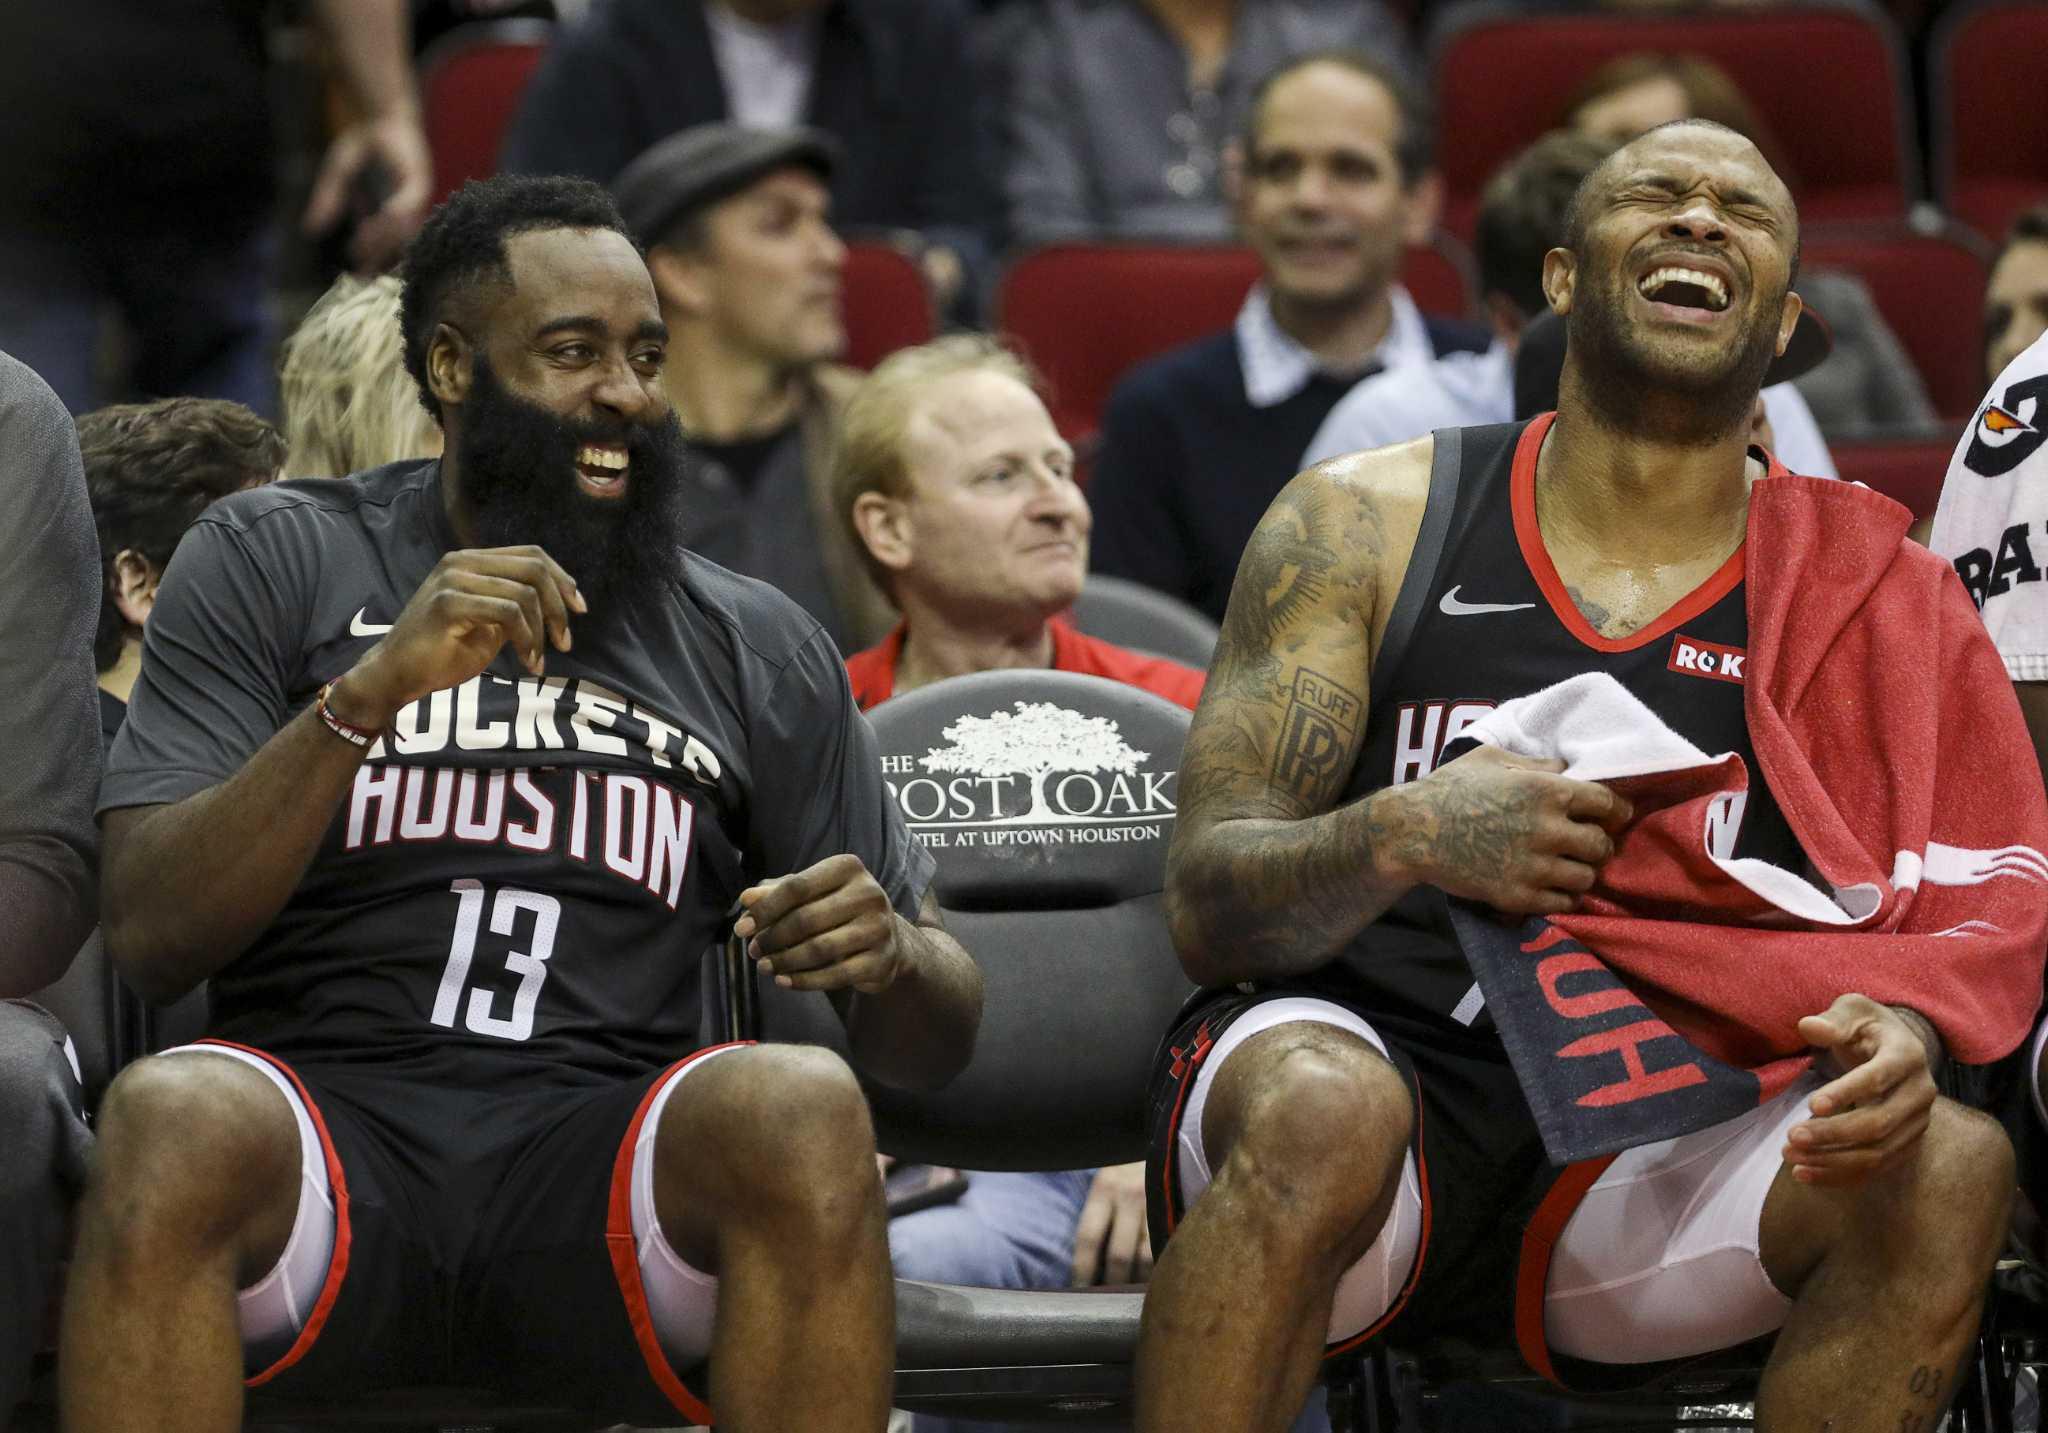 3-pointers: Takeaways from Rockets' win over Trail Blazers